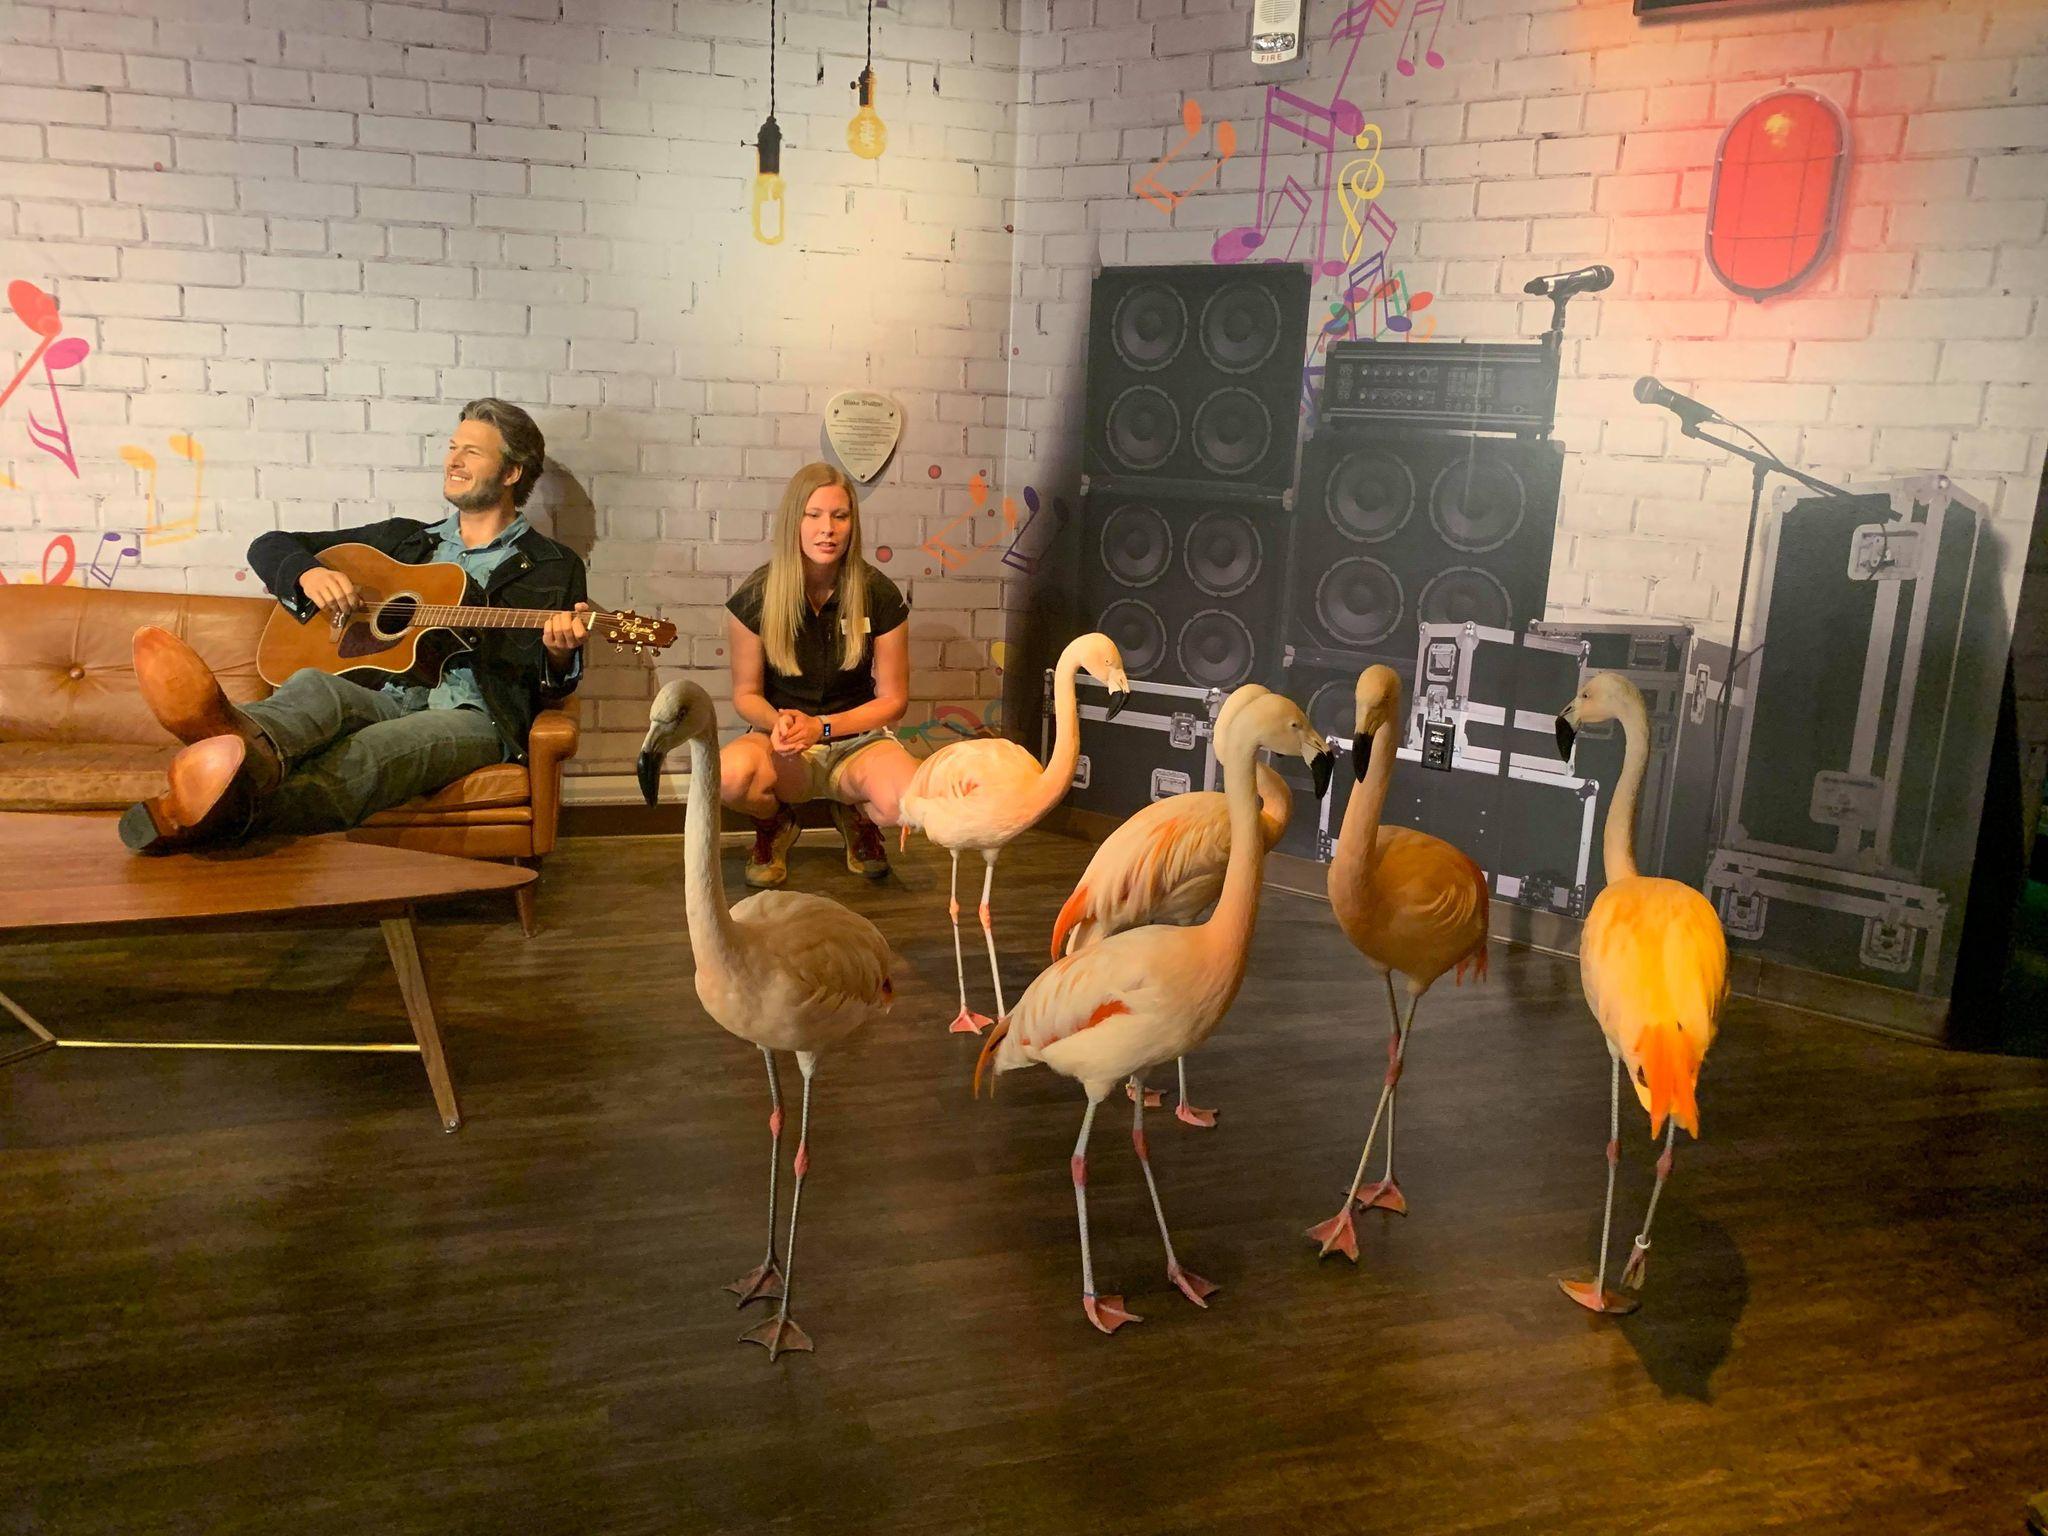 Flamingos visit Wax Museum in Nashville, WKRN photo